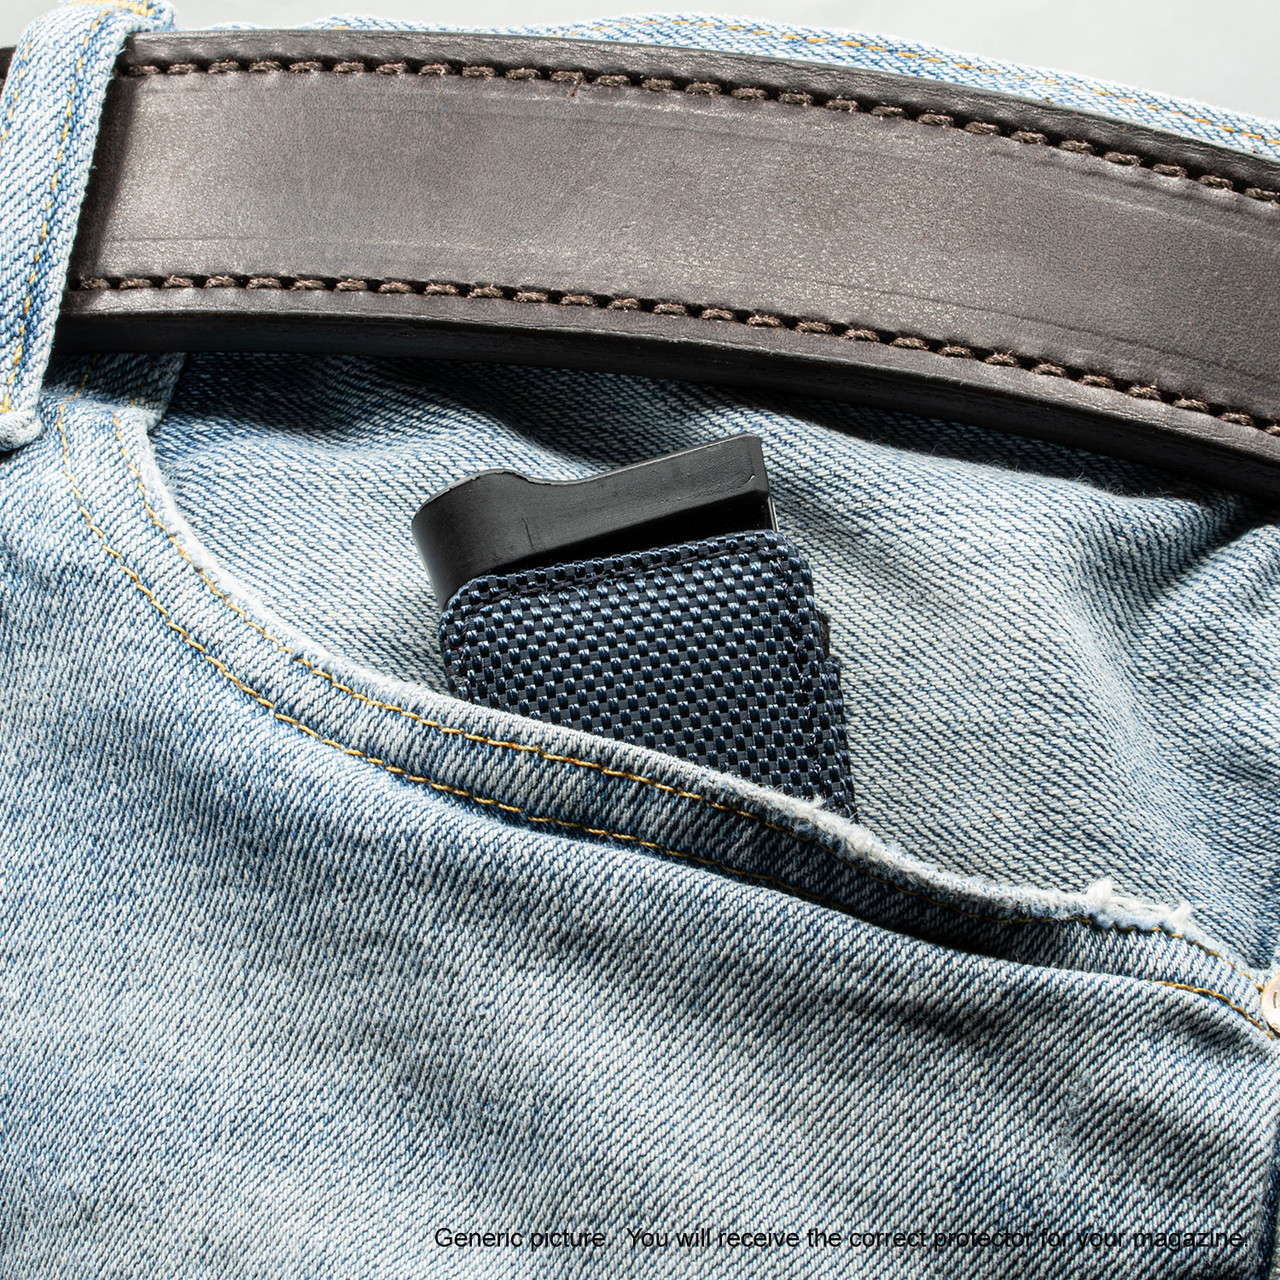 CZ 2075 Rami Blue Covert Magazine Pocket Protector